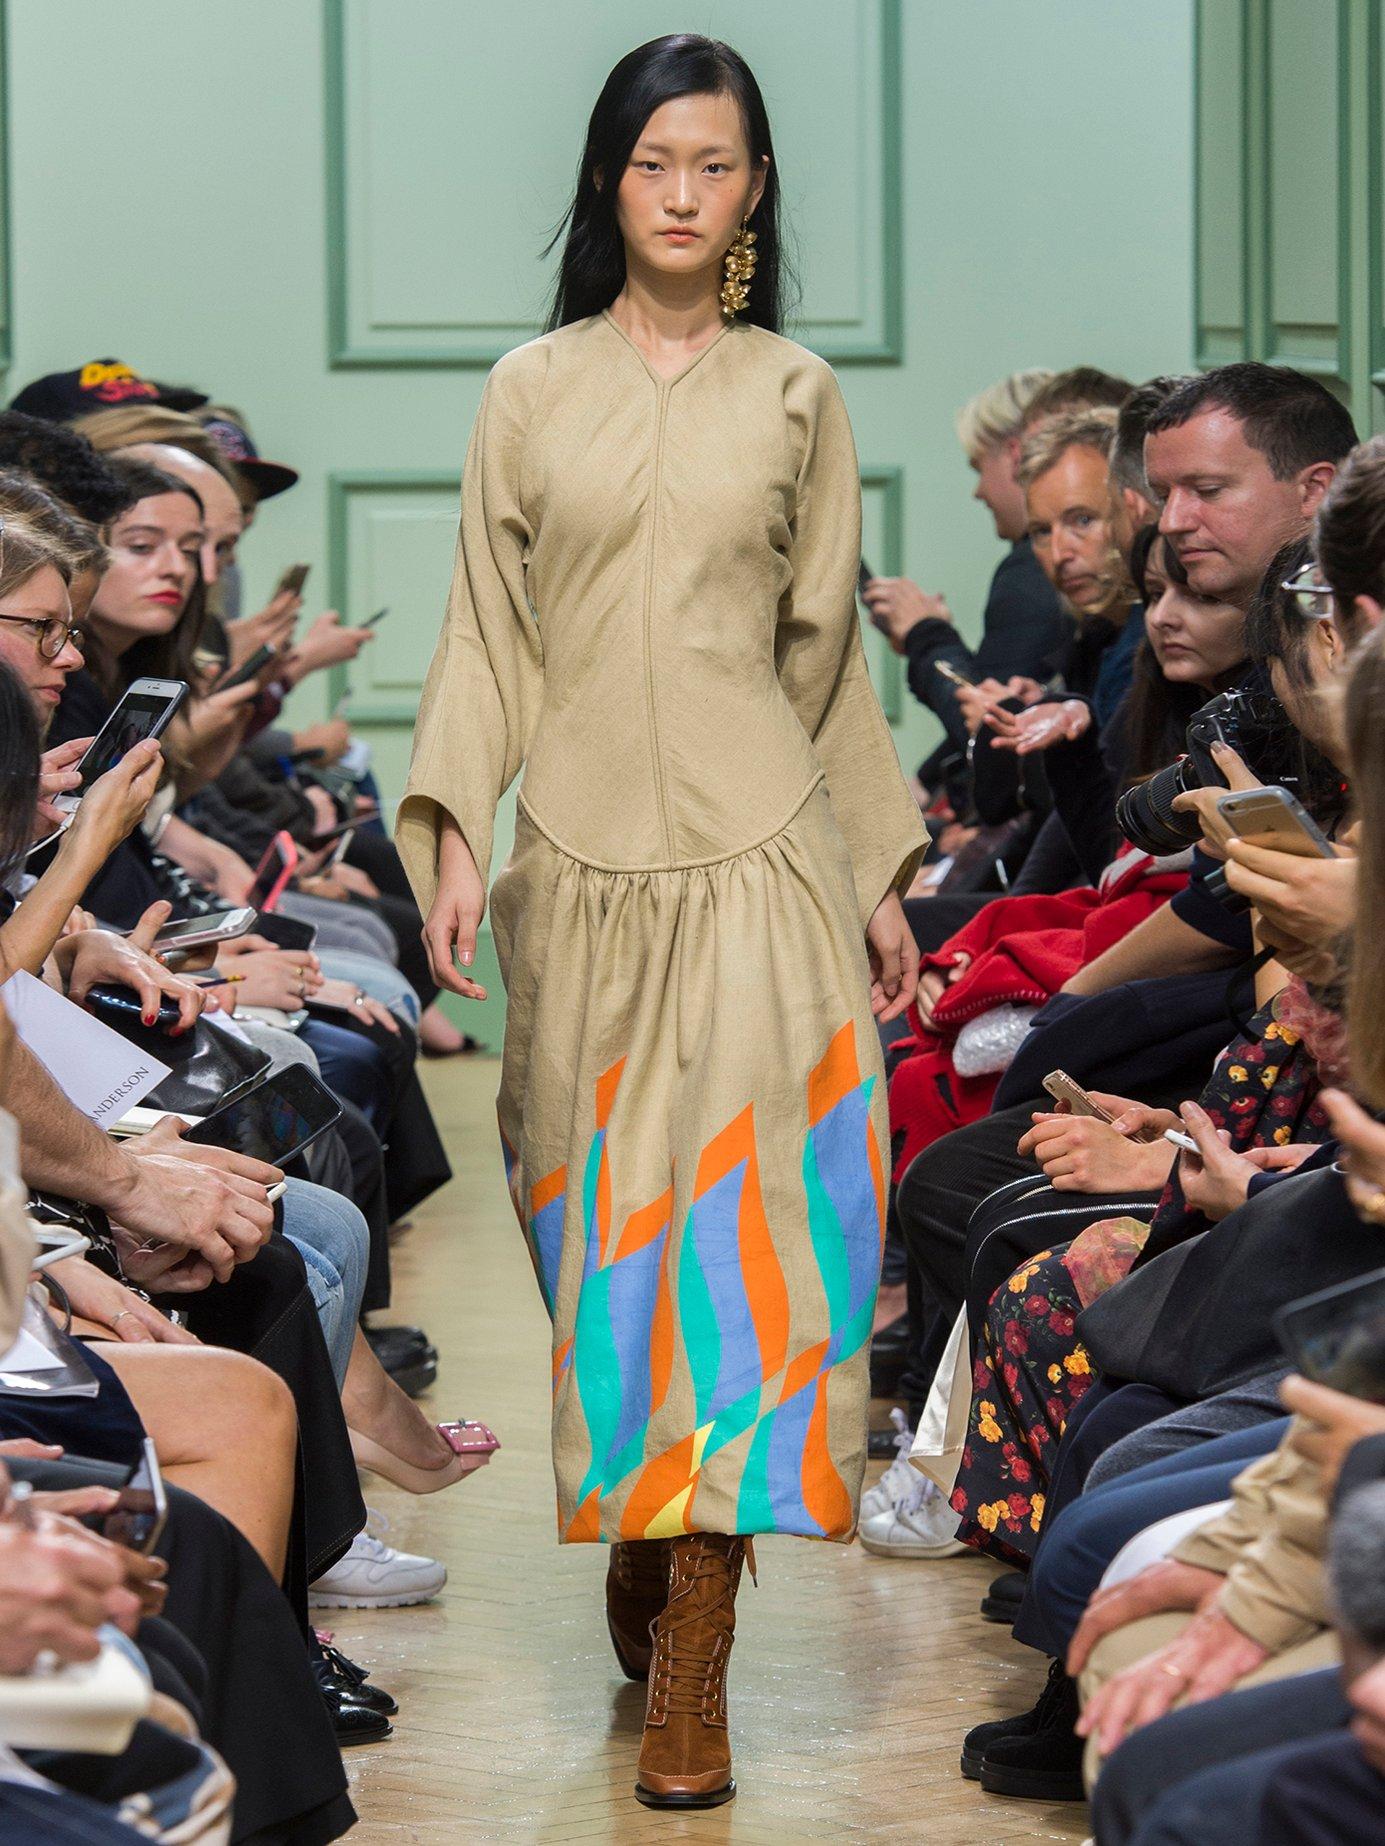 Swoosh-print dropped-waist linen dress by J.W.Anderson